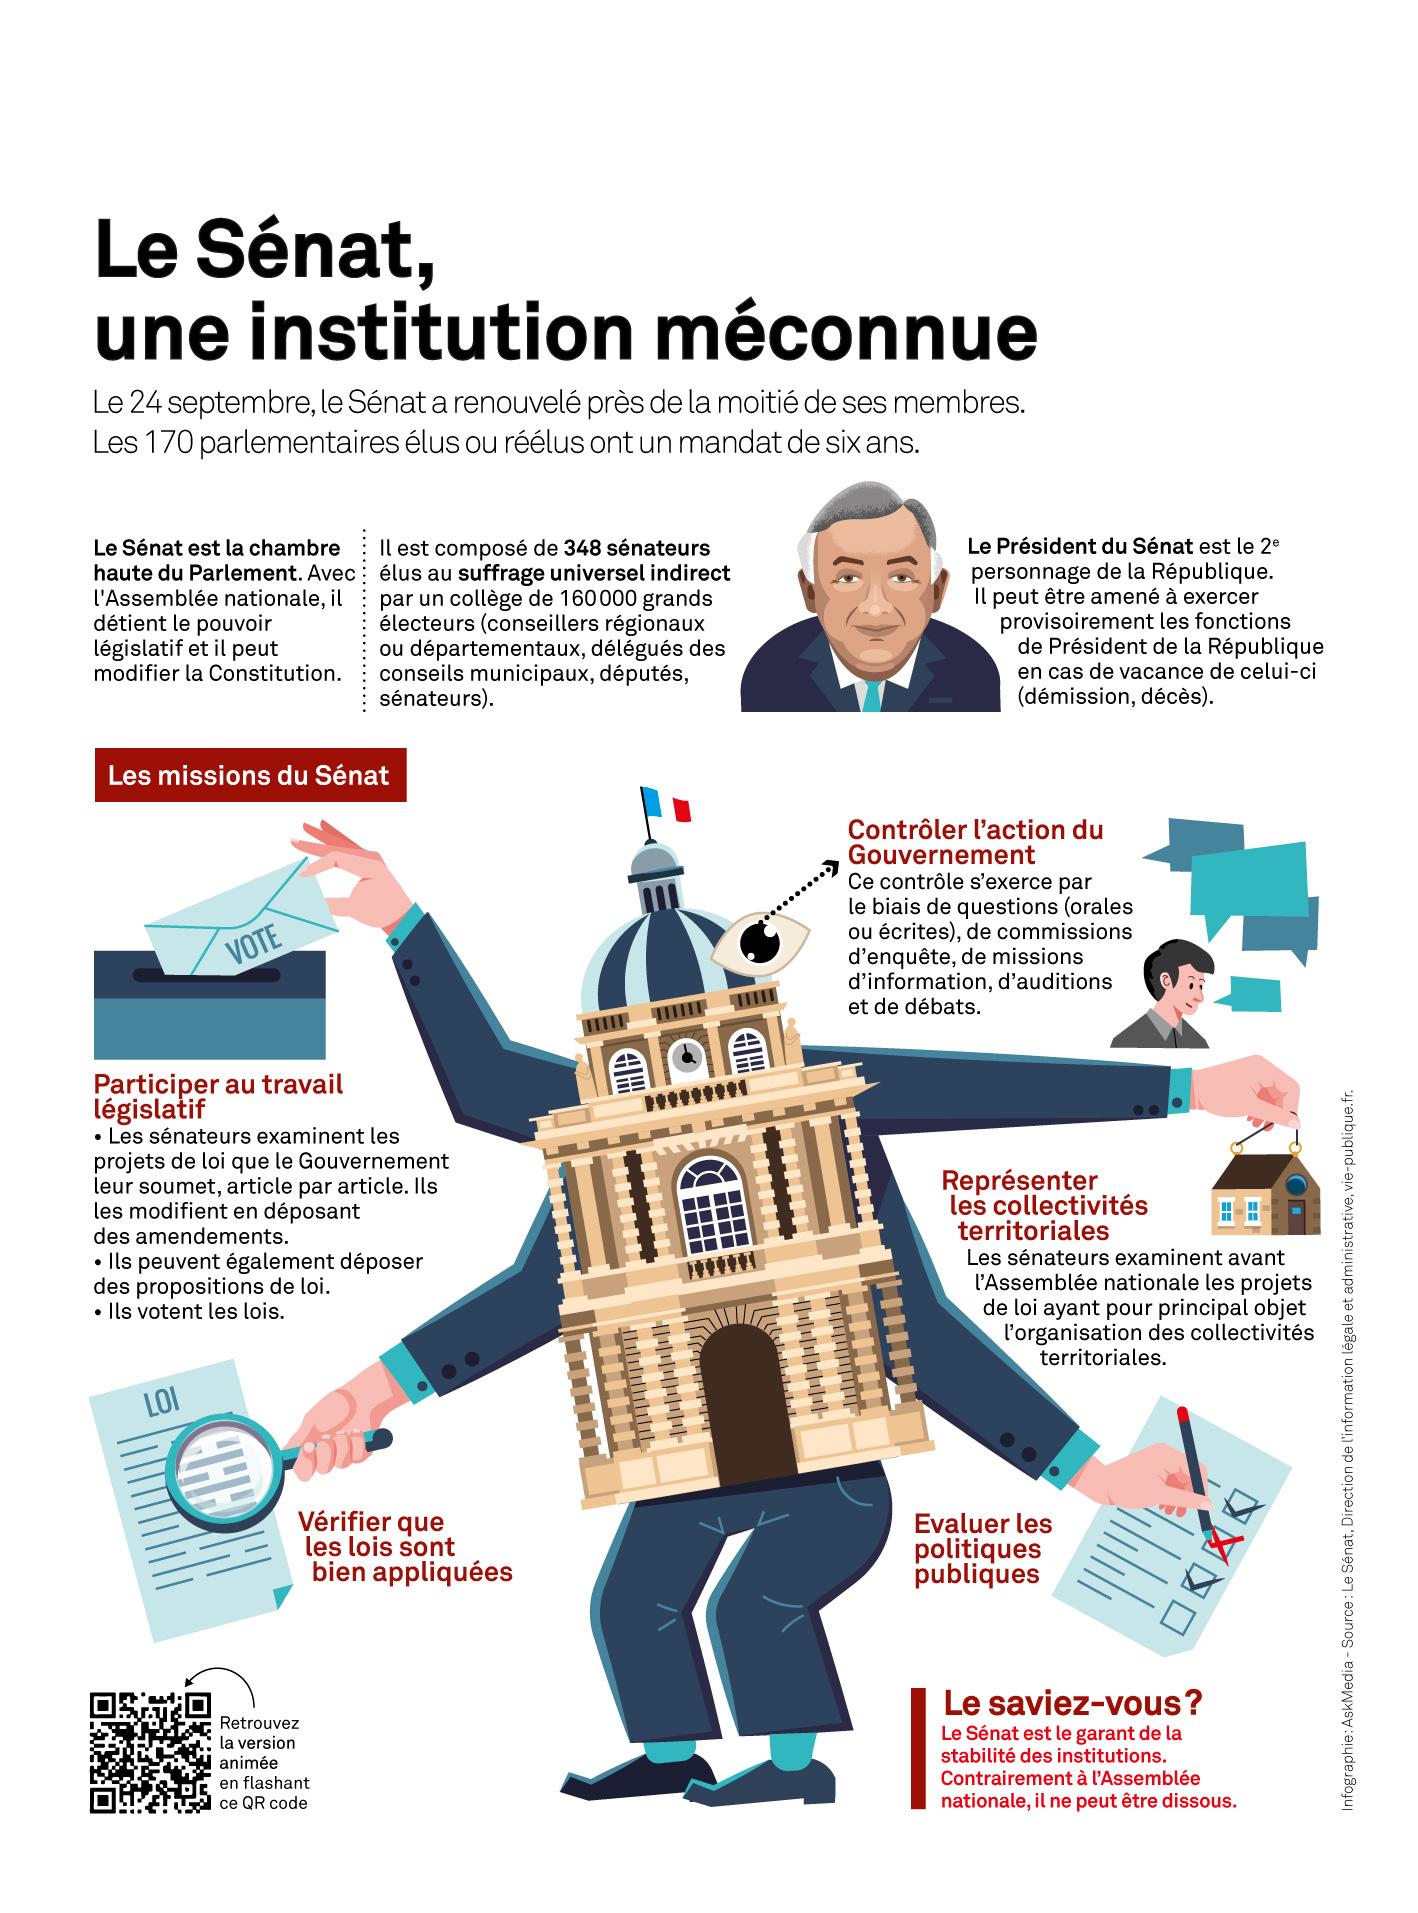 infographie_Senat_LeParisienMag_by_Cedric_Audinot